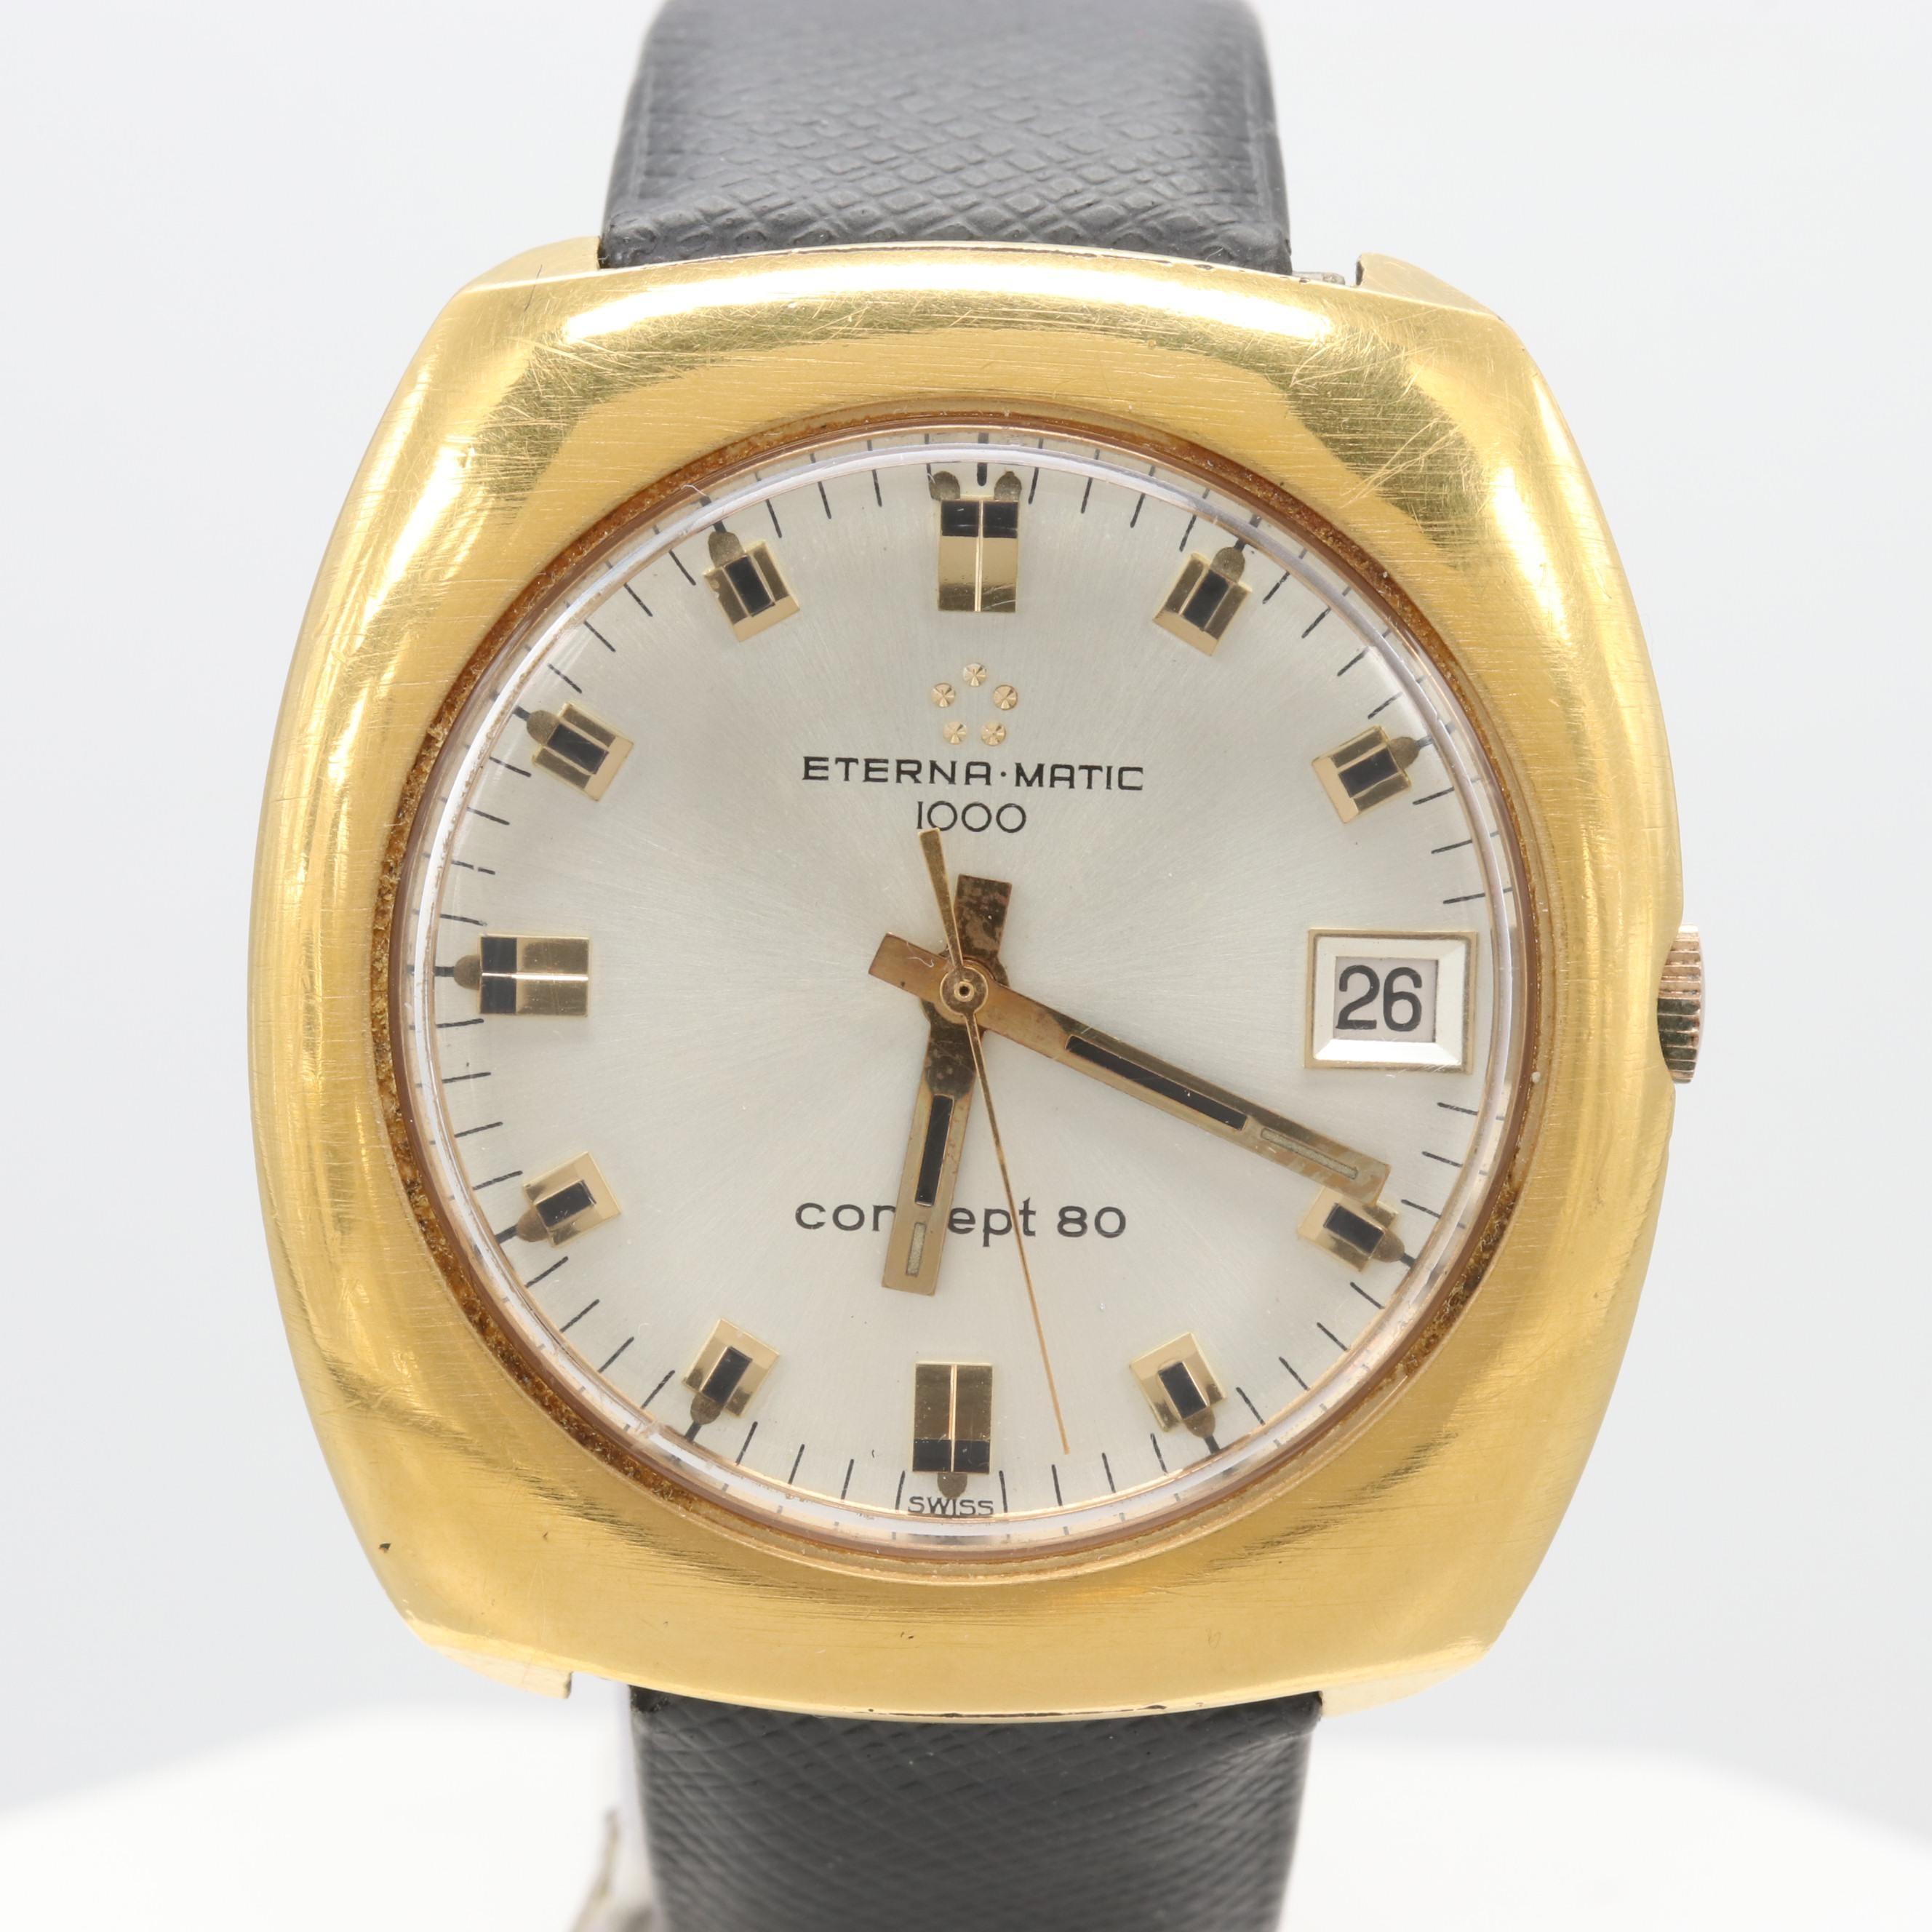 Eterna Eterna-Matic 1000 Concept 180 Automatic Wristwatch Circa 1969